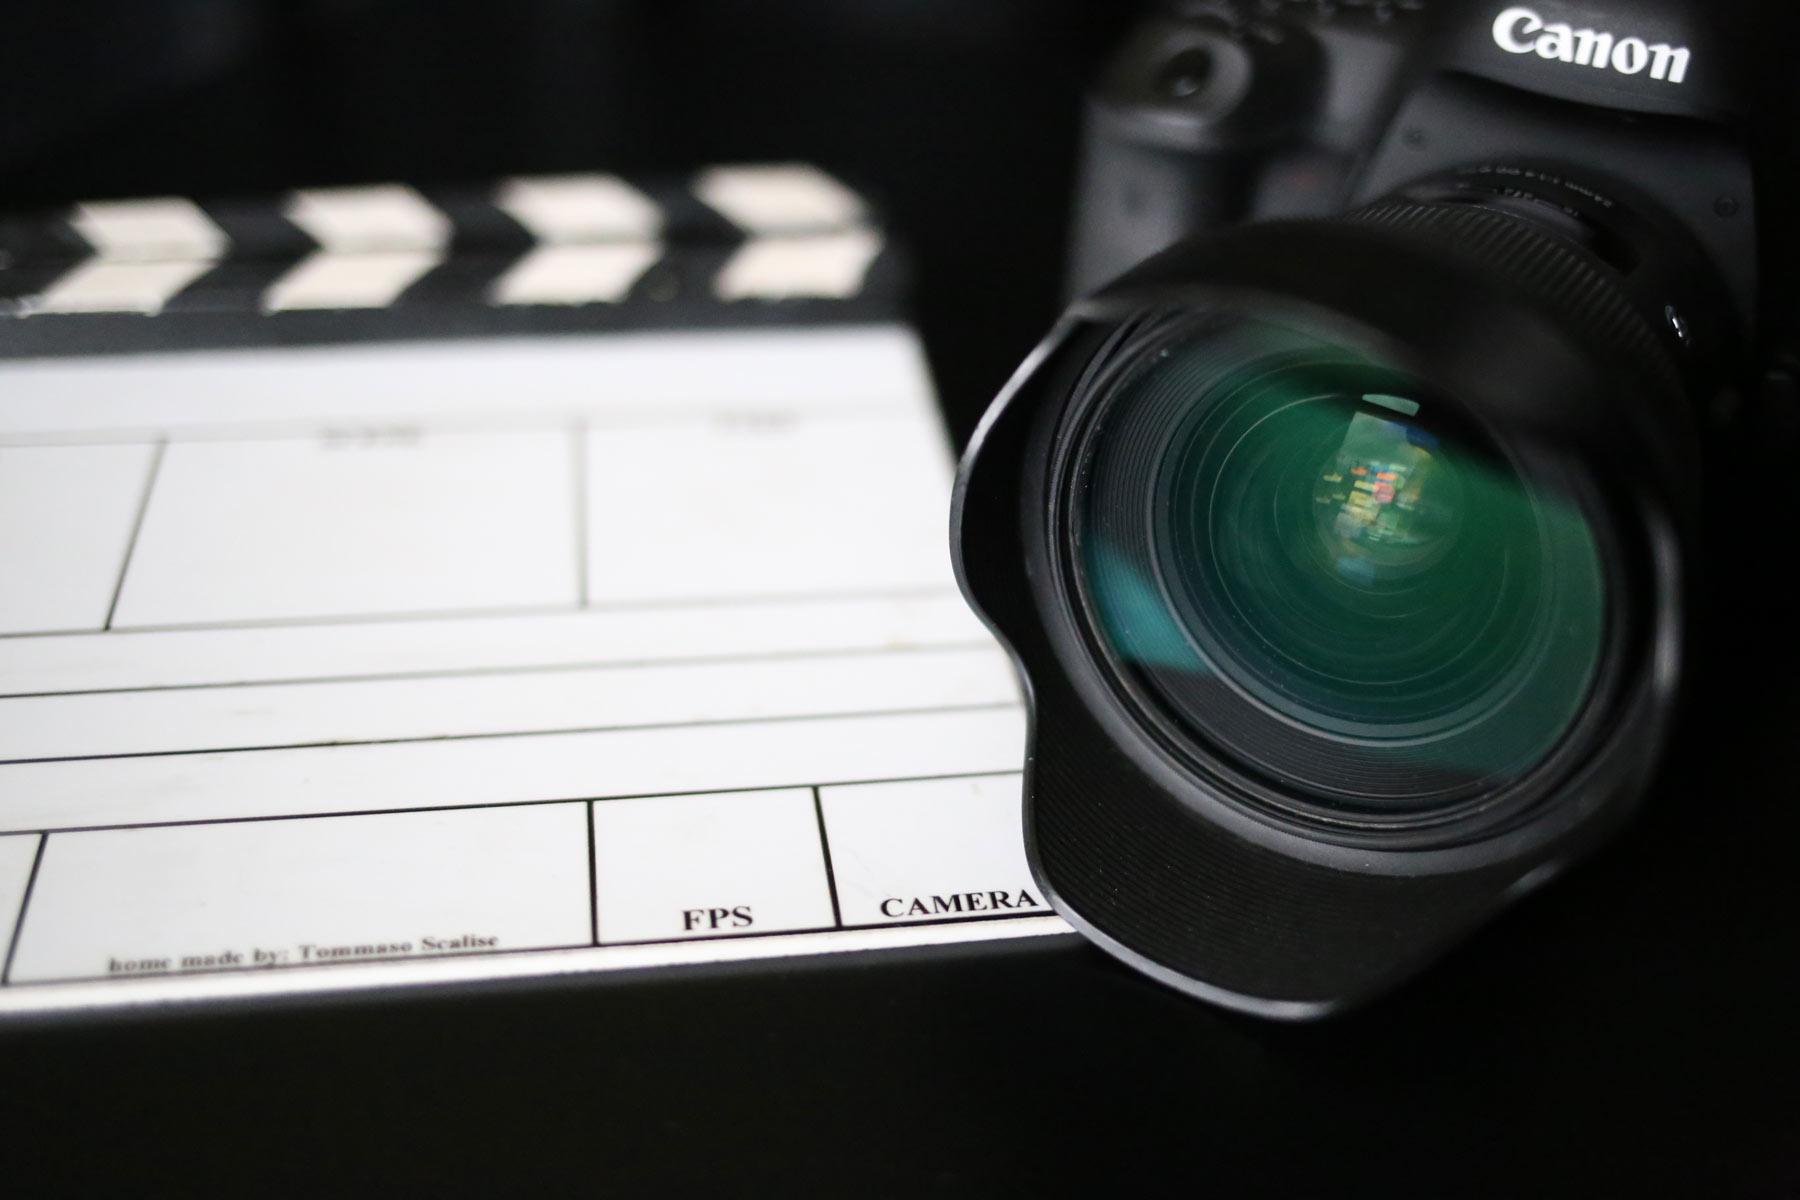 Tommaso Scalise videomaker